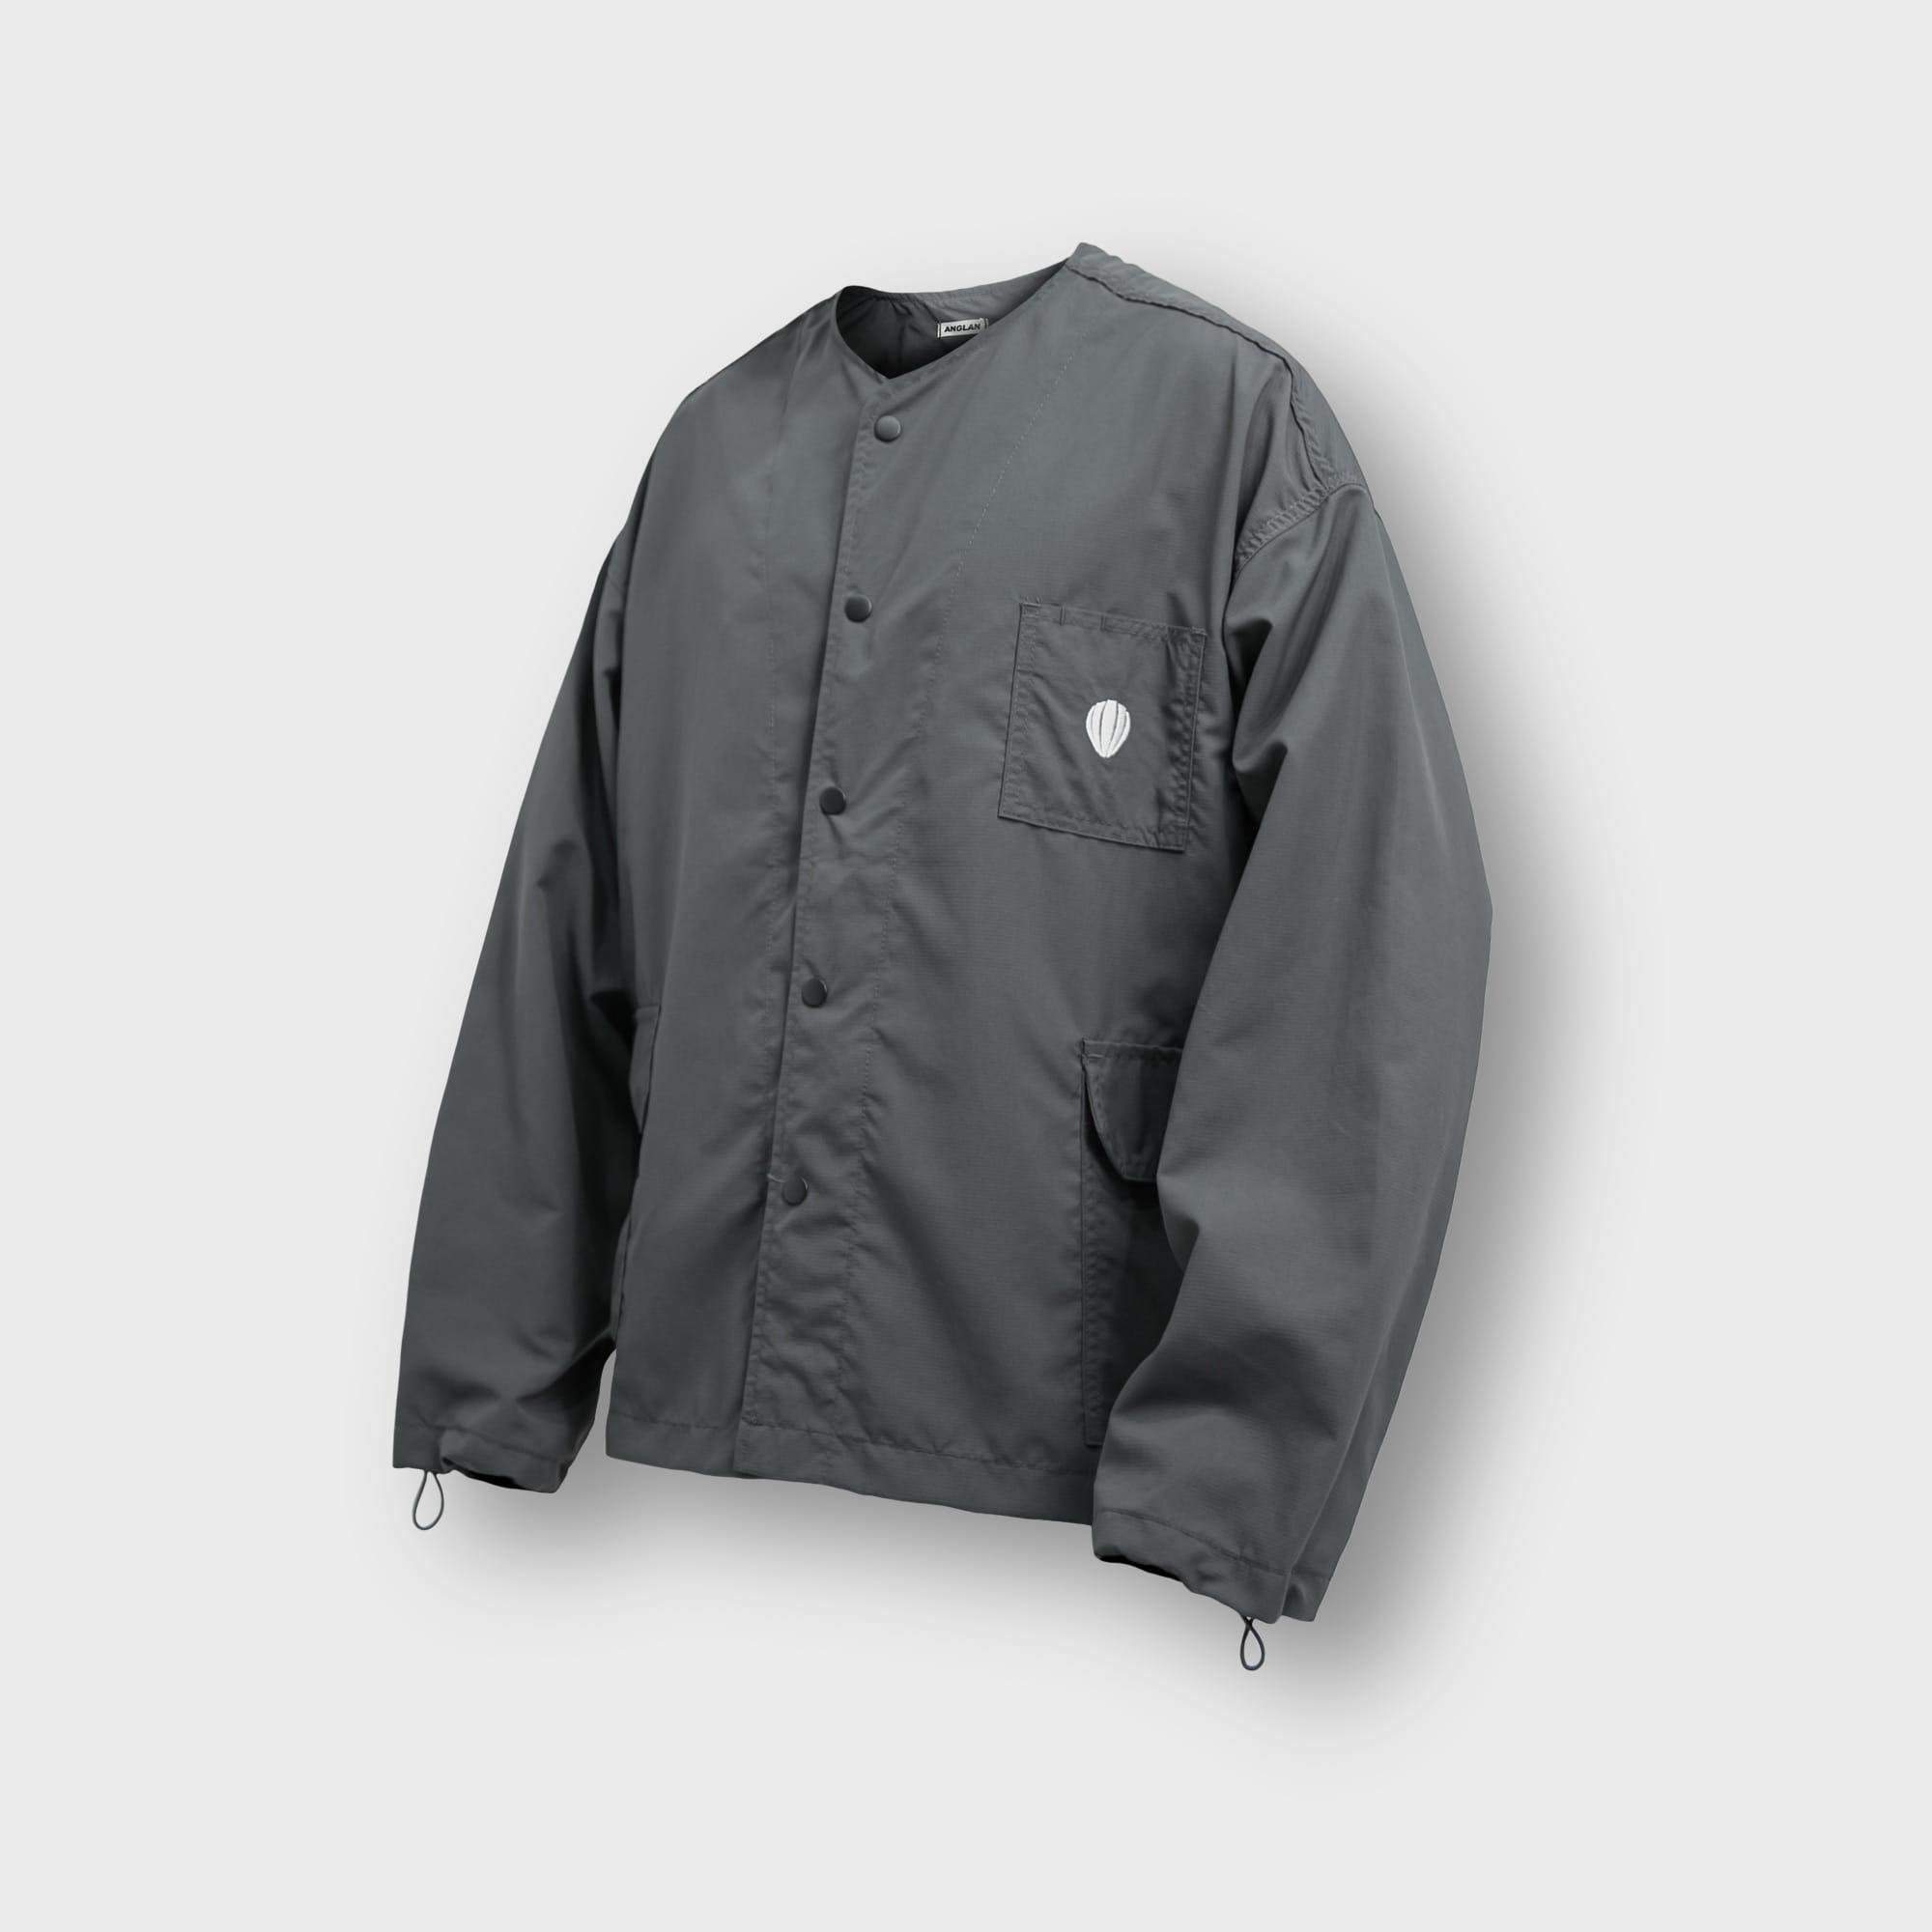 [AG] Rib Nylon Public Jacket - Grey